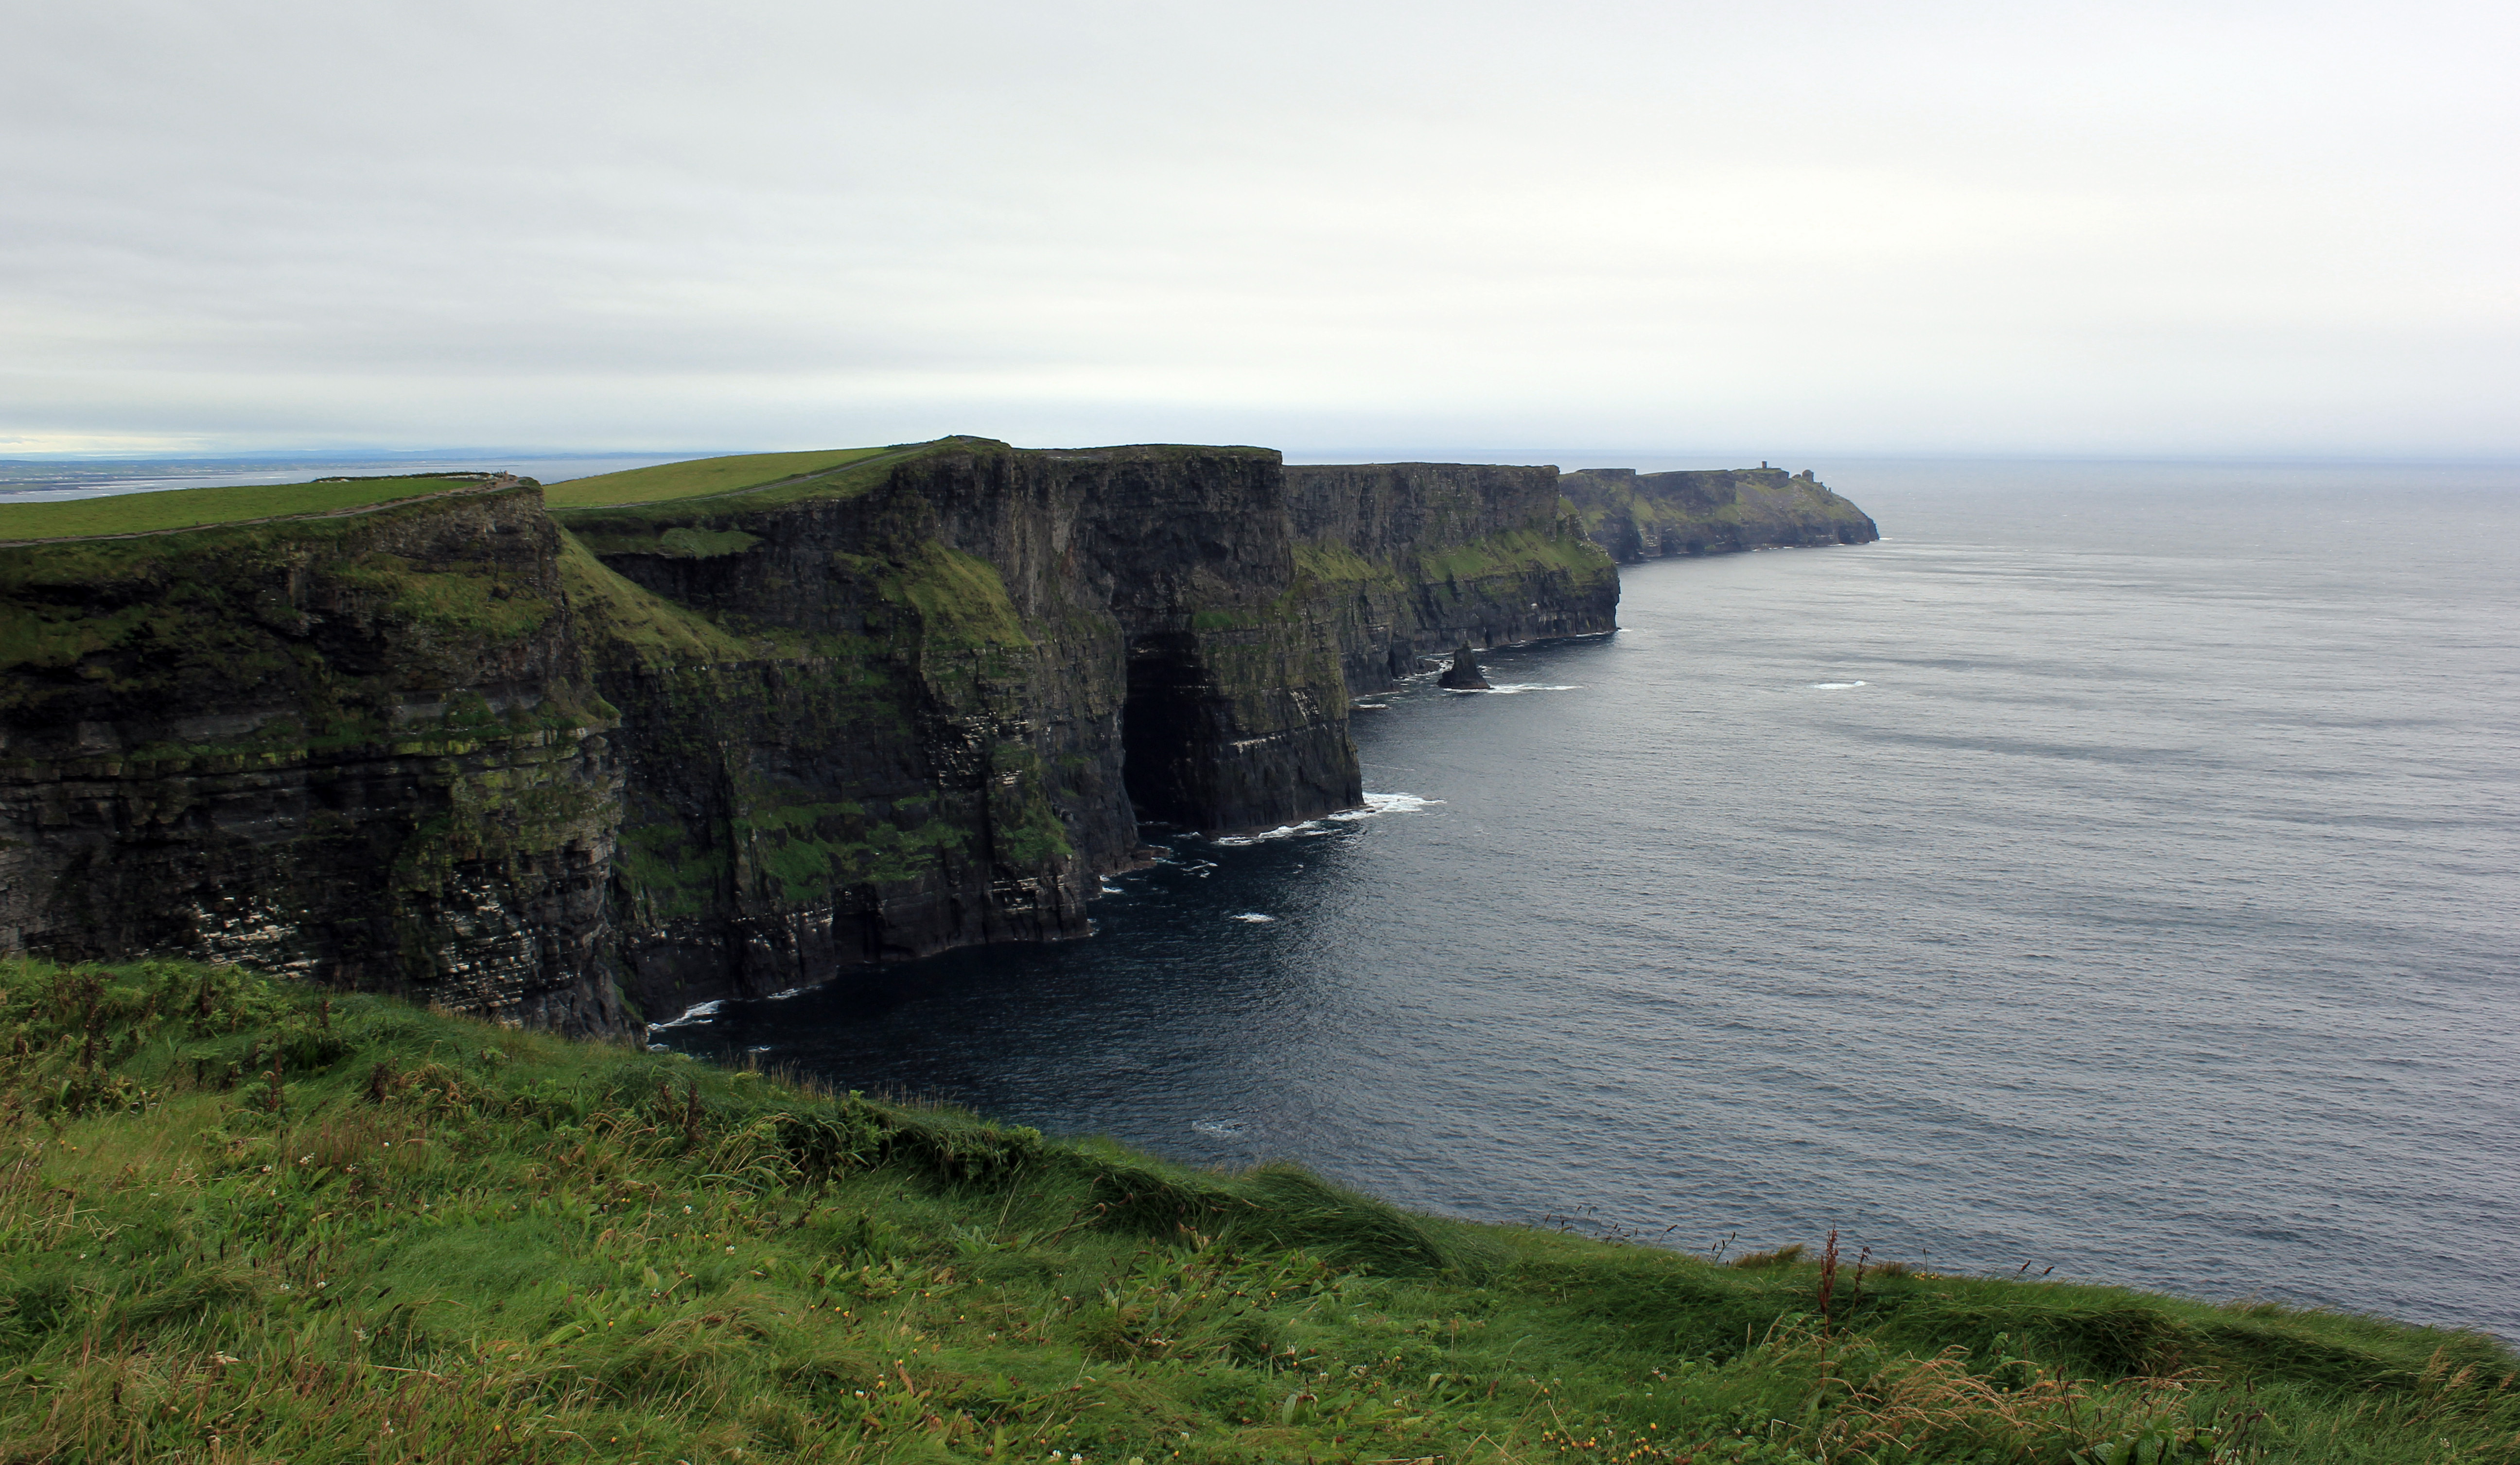 Voyages-et-compagnie.com - Blog voyage | Road trip en Irlande Cliff of Moher